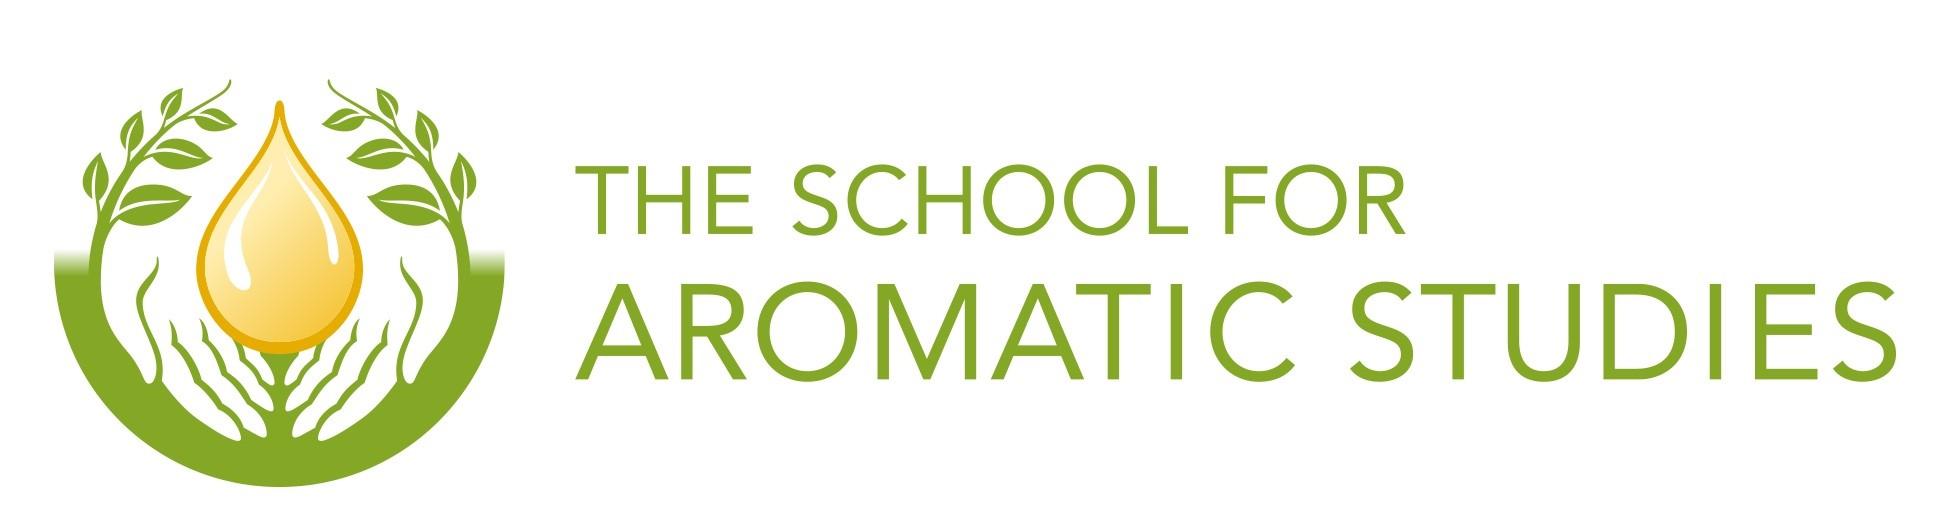 The School for Aromatic Studies